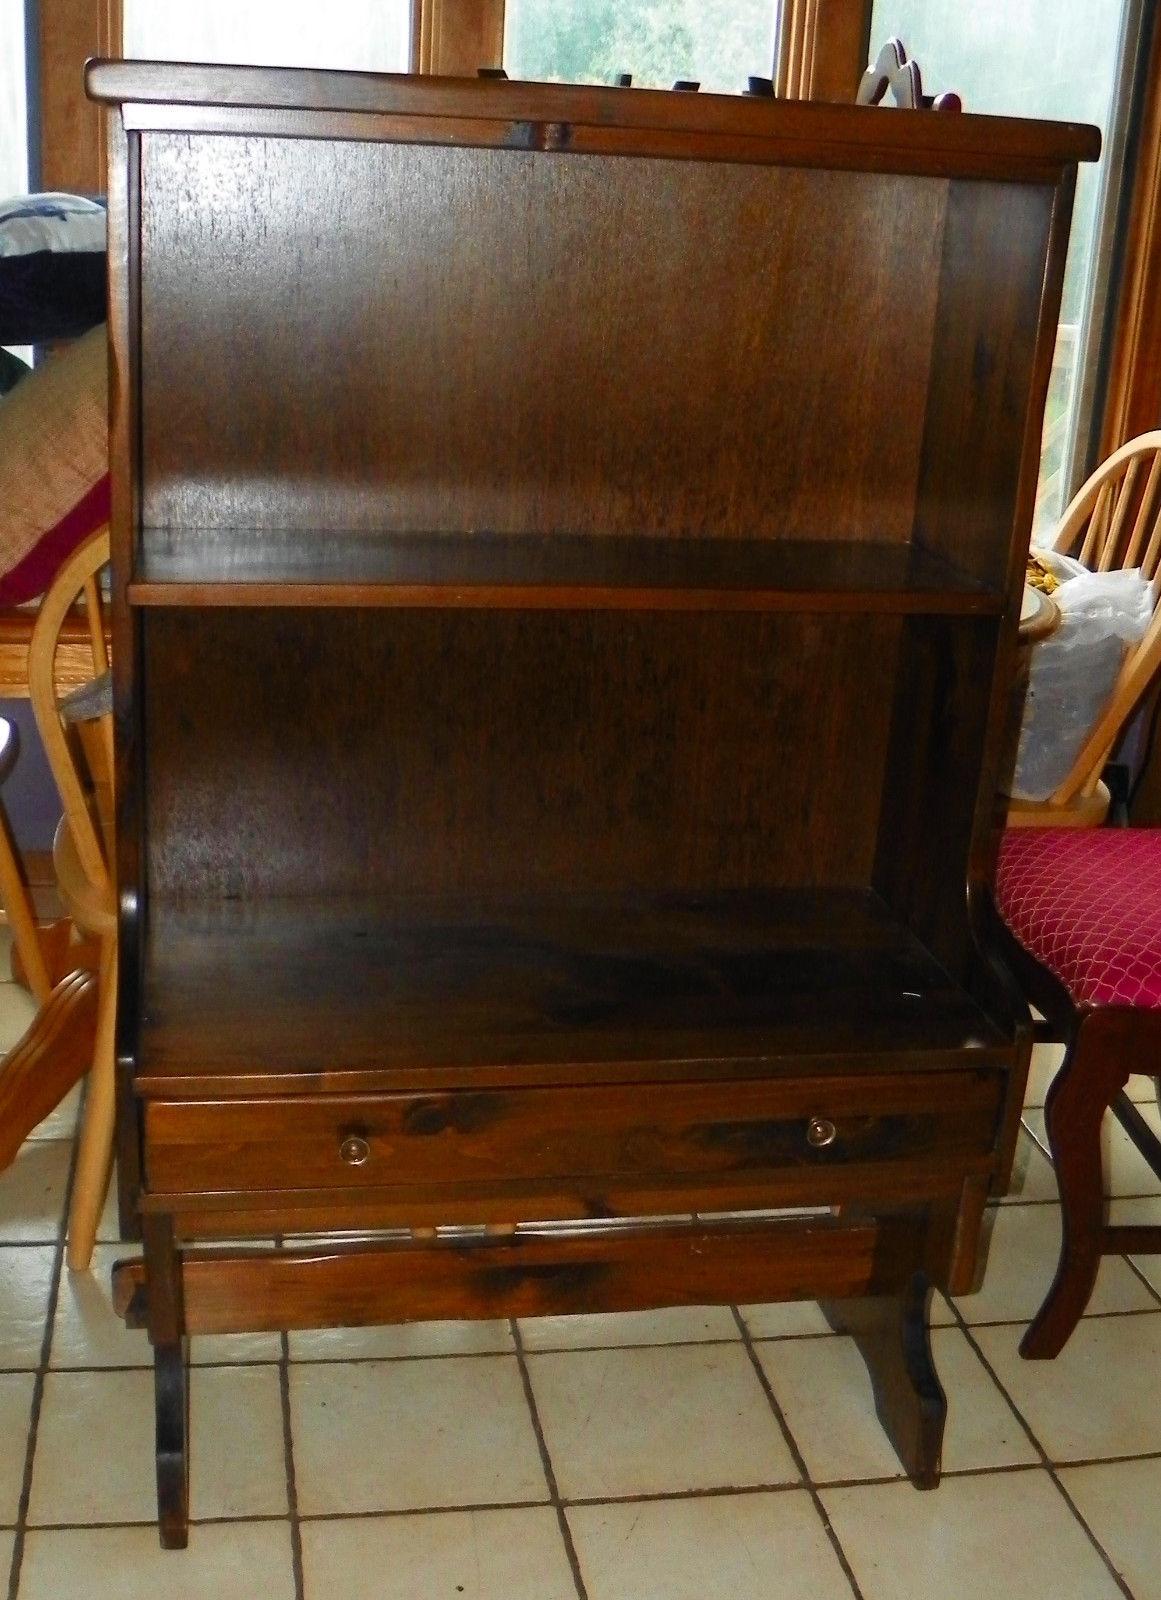 Pine Bookshelf / Cabinet By Mohawk Furniture / Old Tavern Pine (RP SH81)